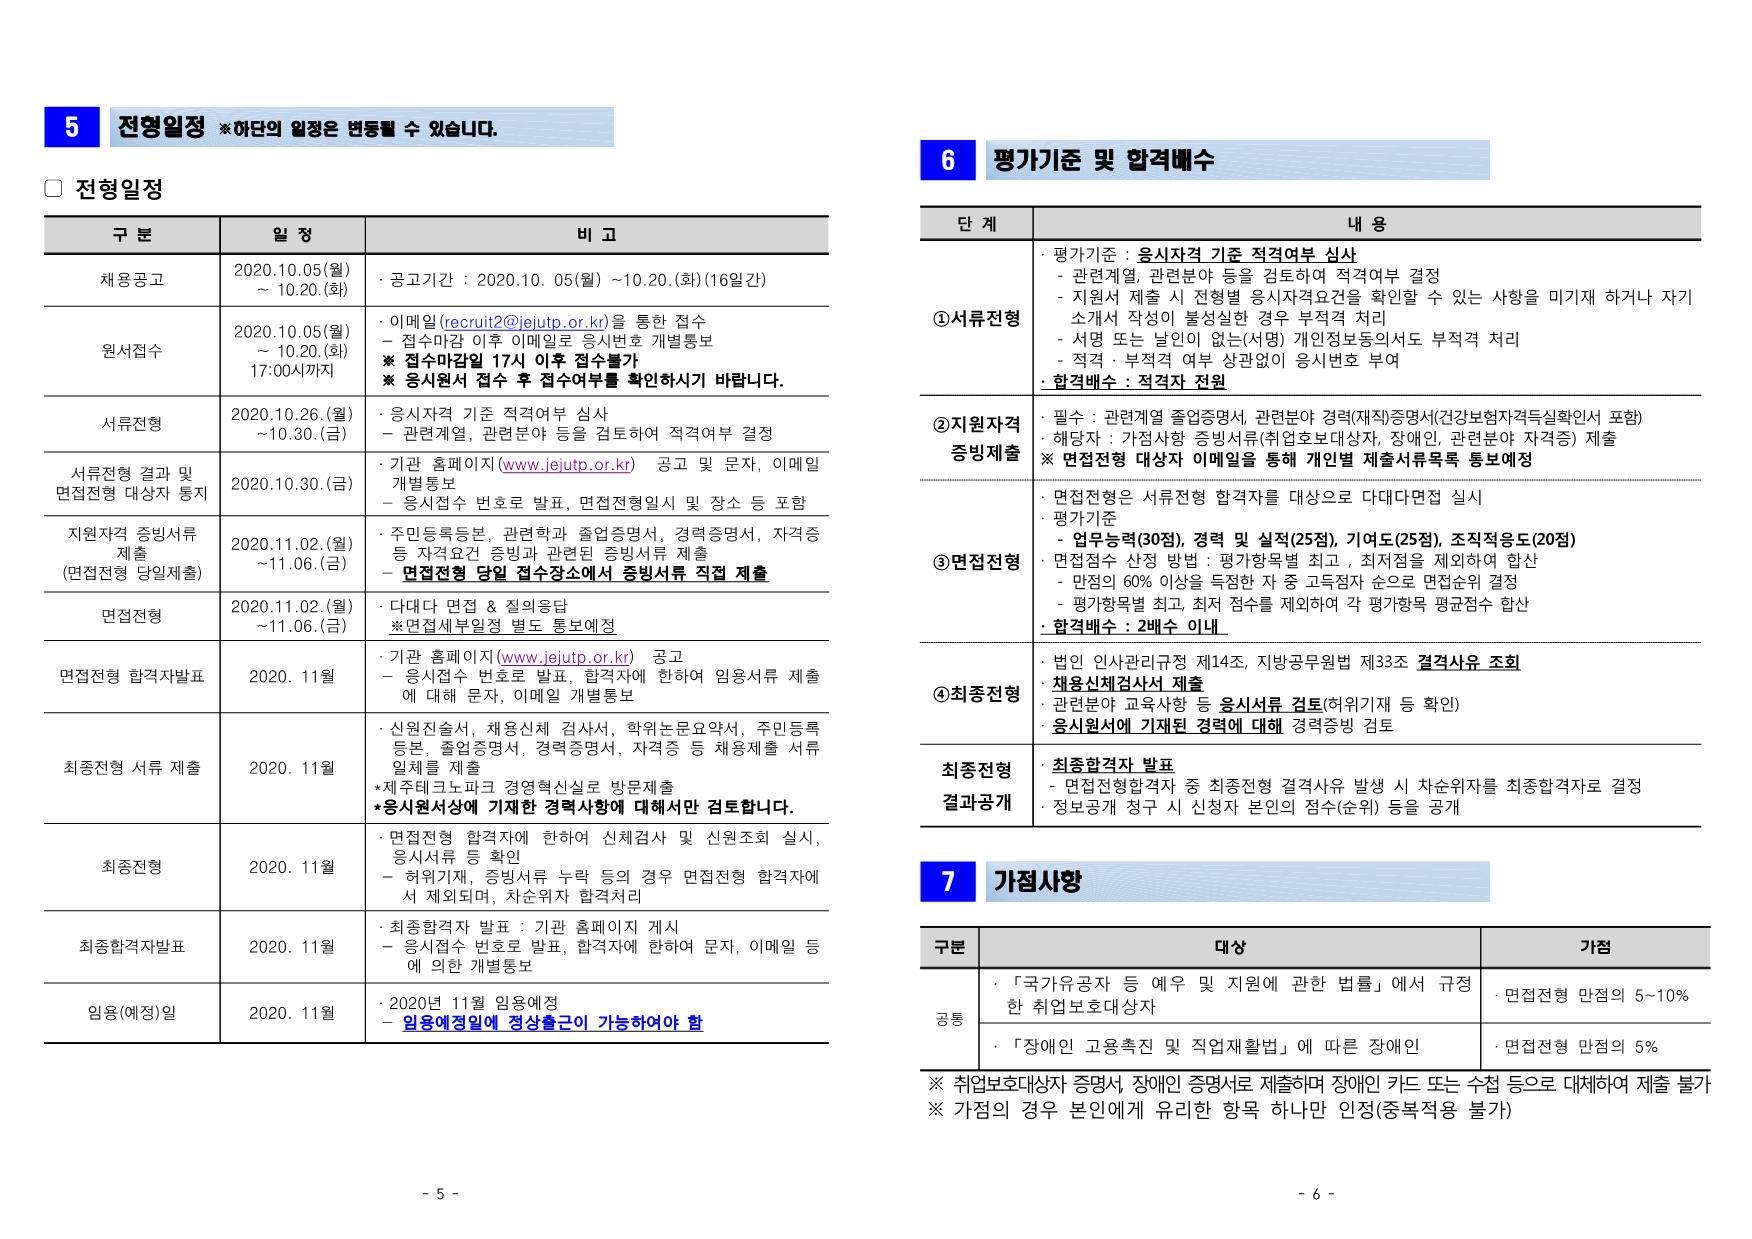 16ef9f2f-1ba0-43d6-a45f-f5a831c0d54d.pdf-0003.jpg